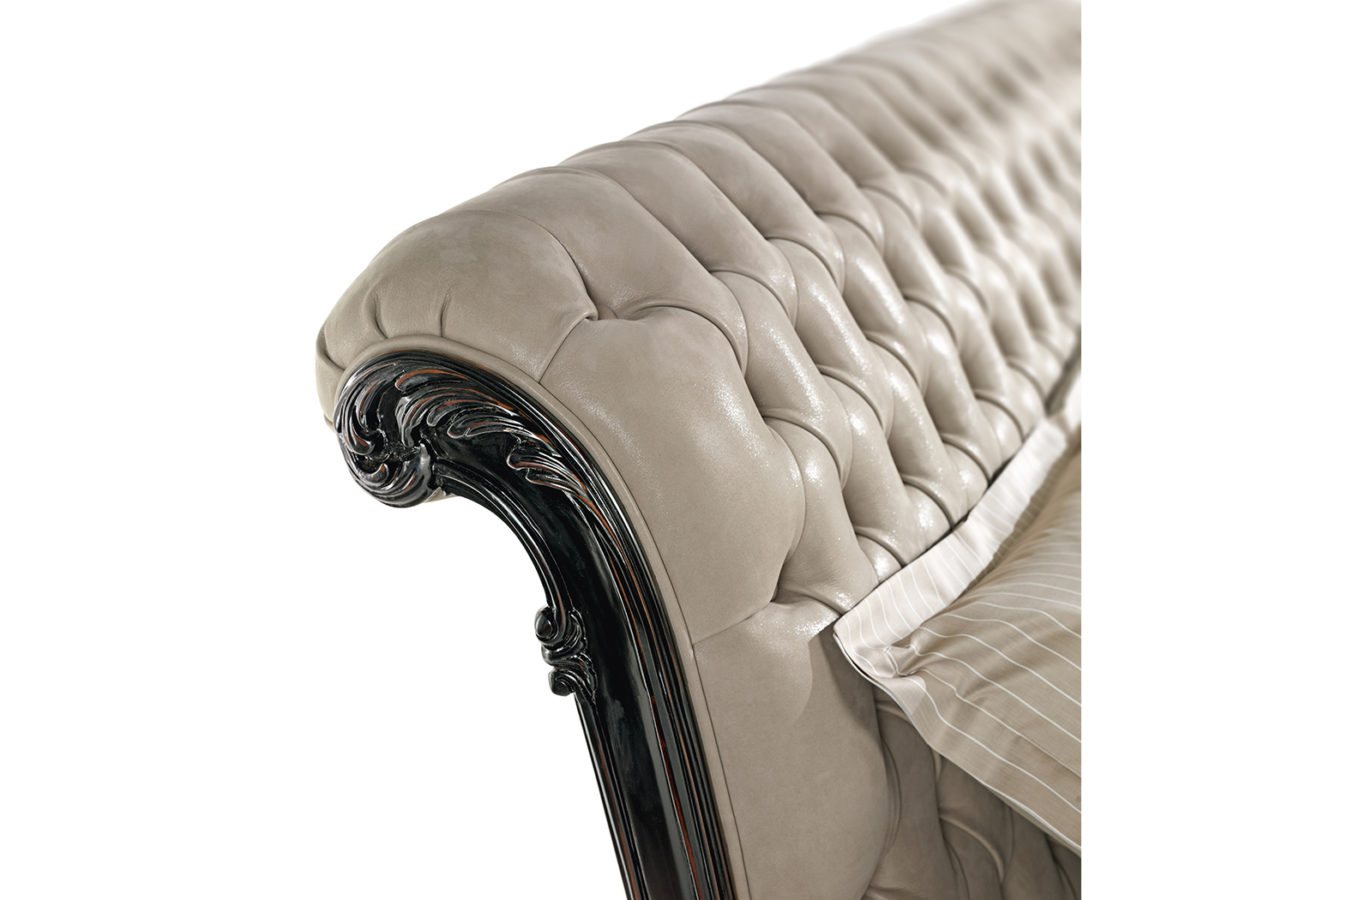 Gianfranco Ferre Home Allister Bed 01